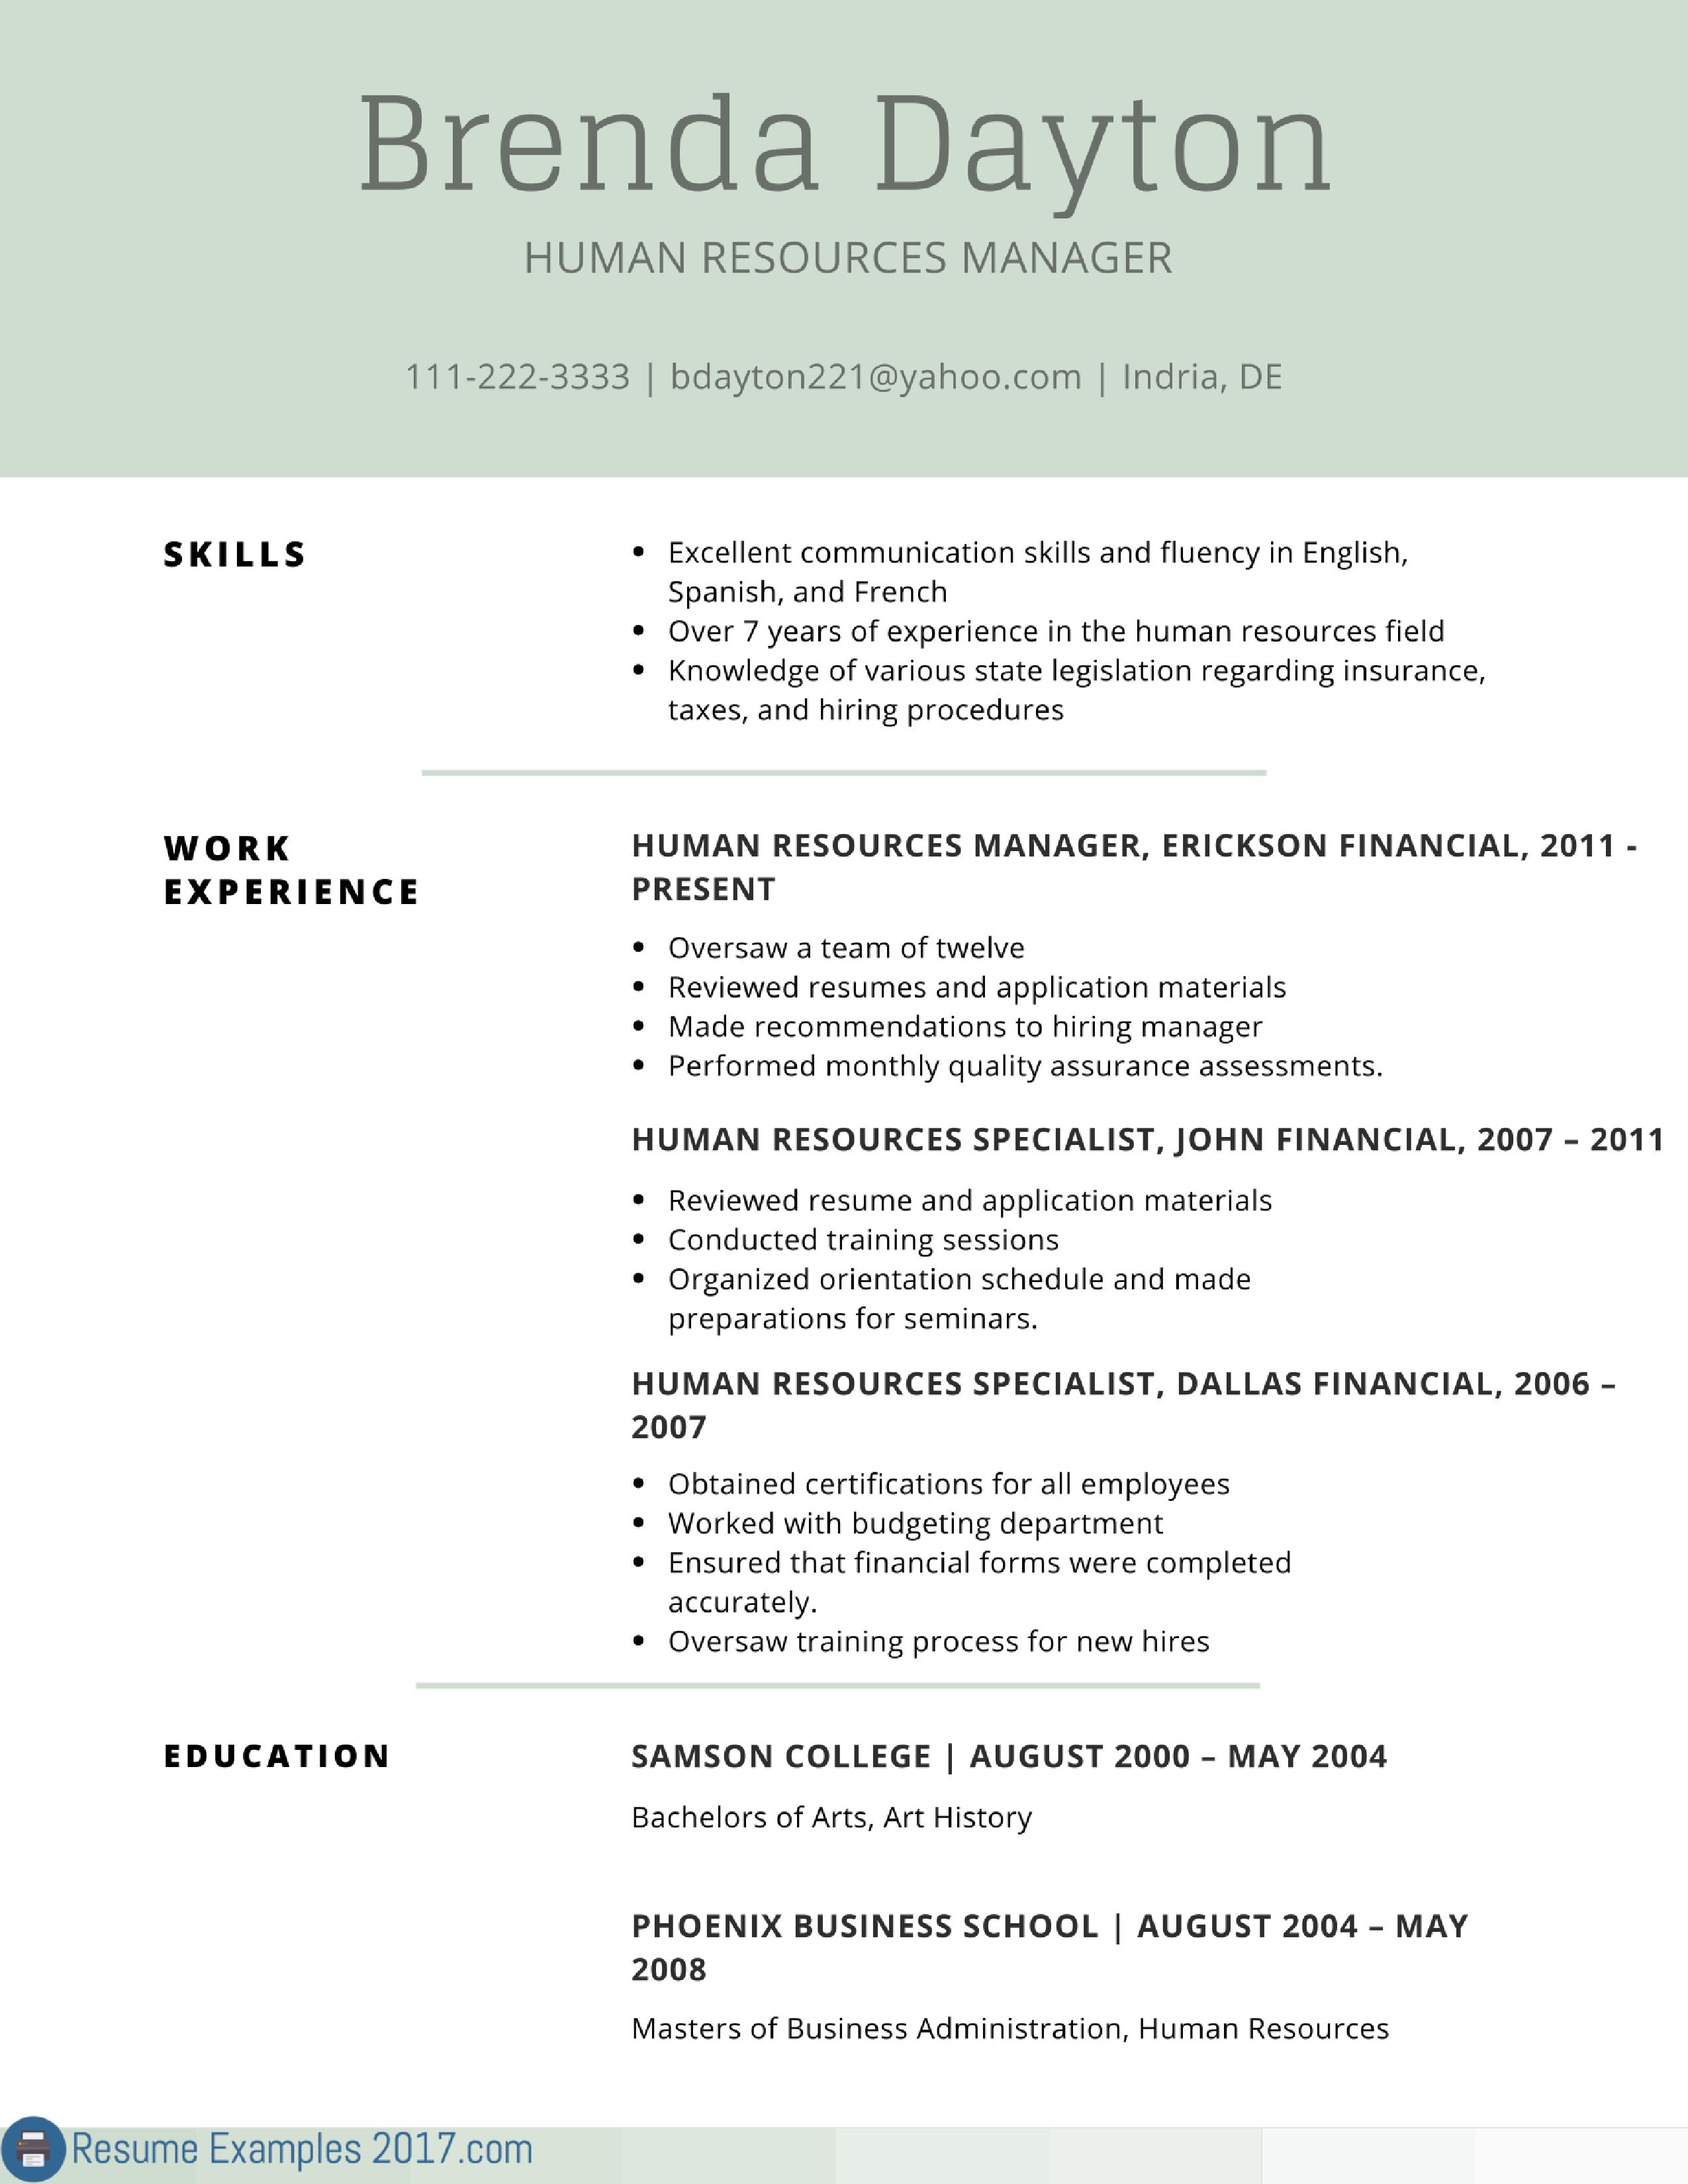 resume format 2017 examples resume format pinterest resume